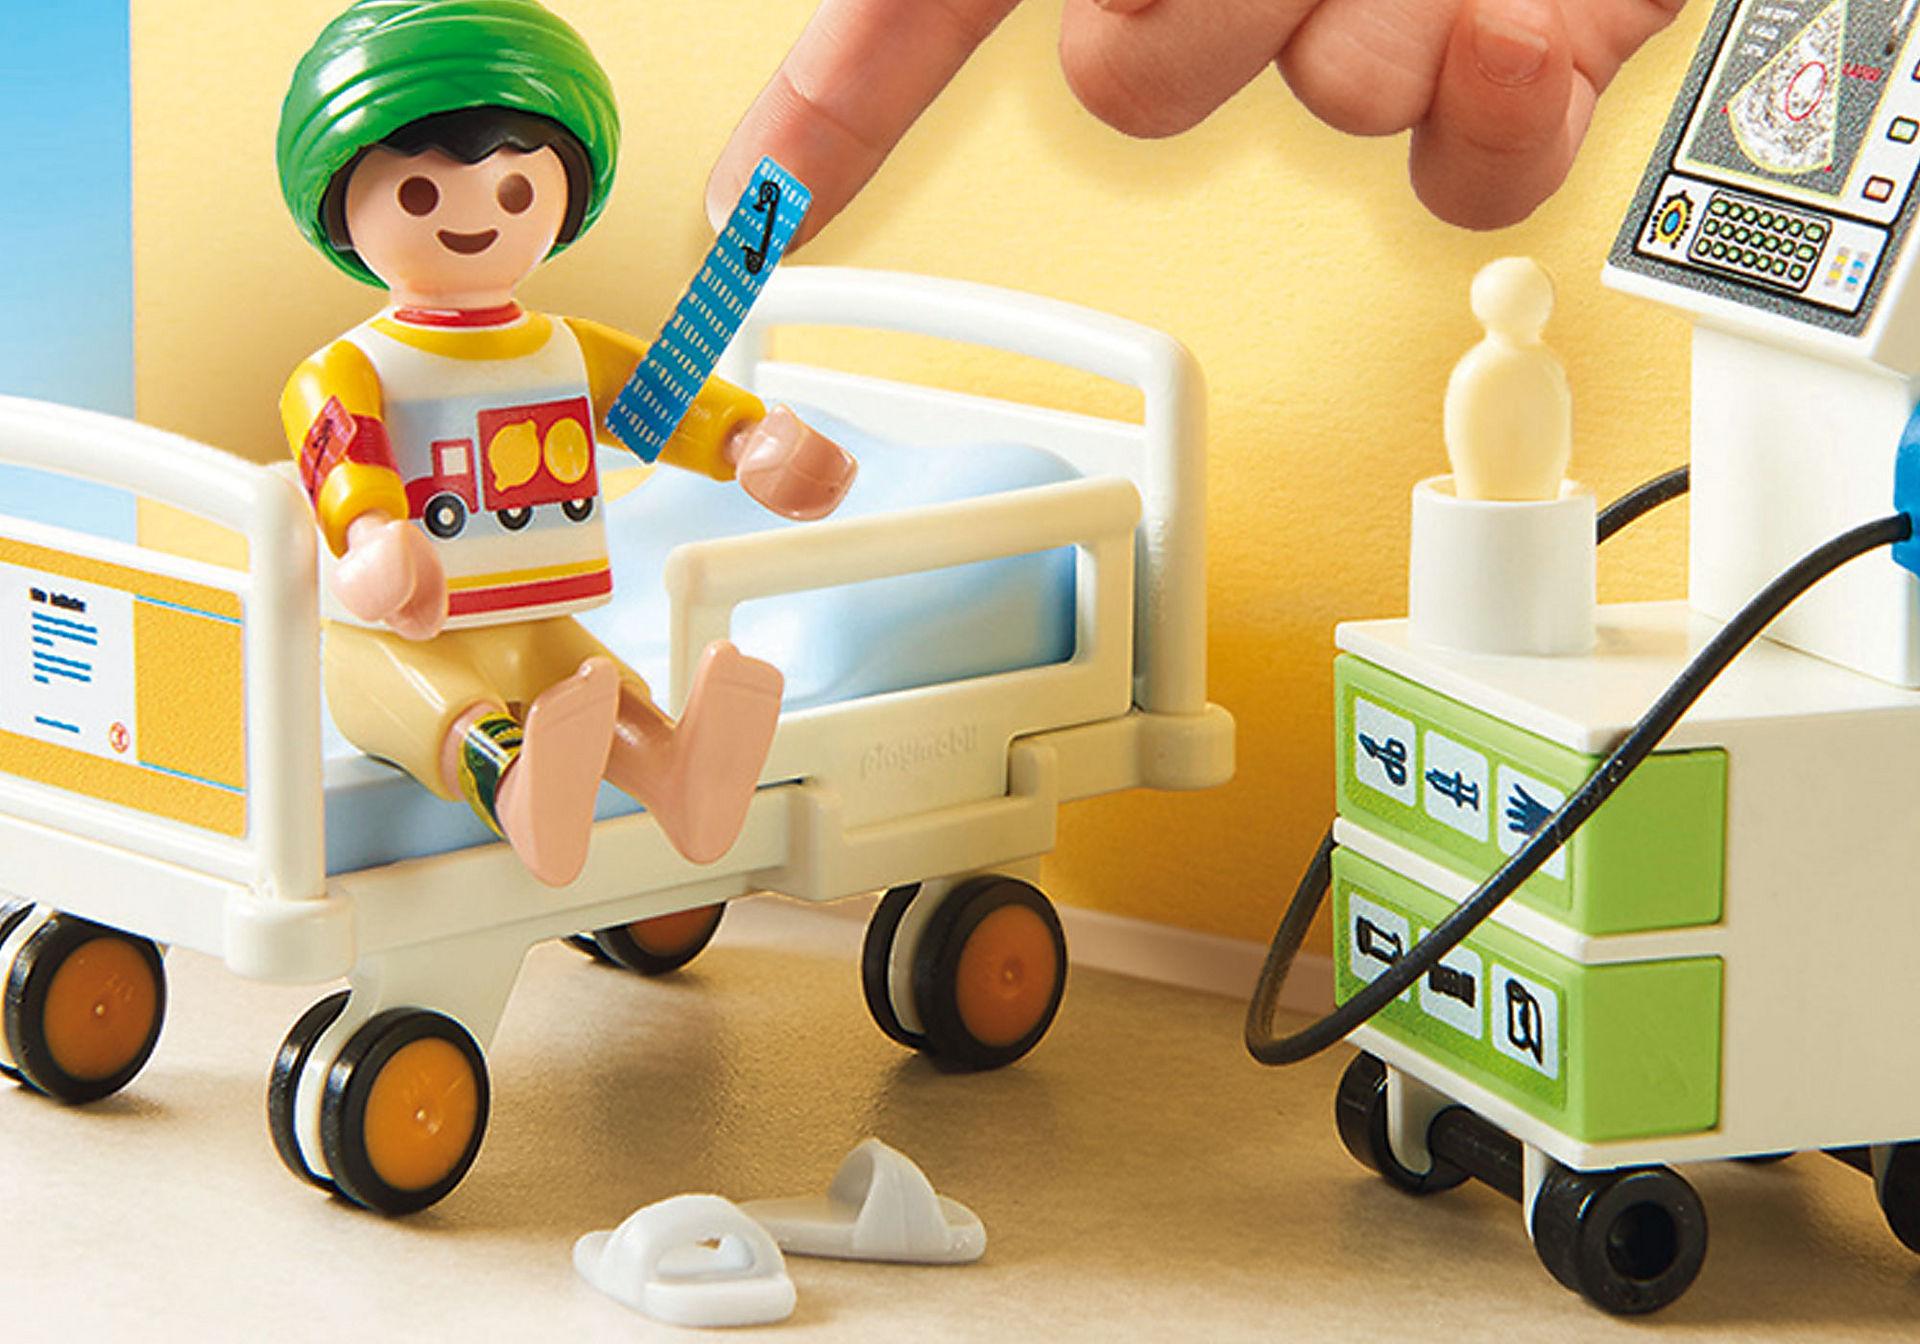 70192 Children's Hospital Room zoom image4